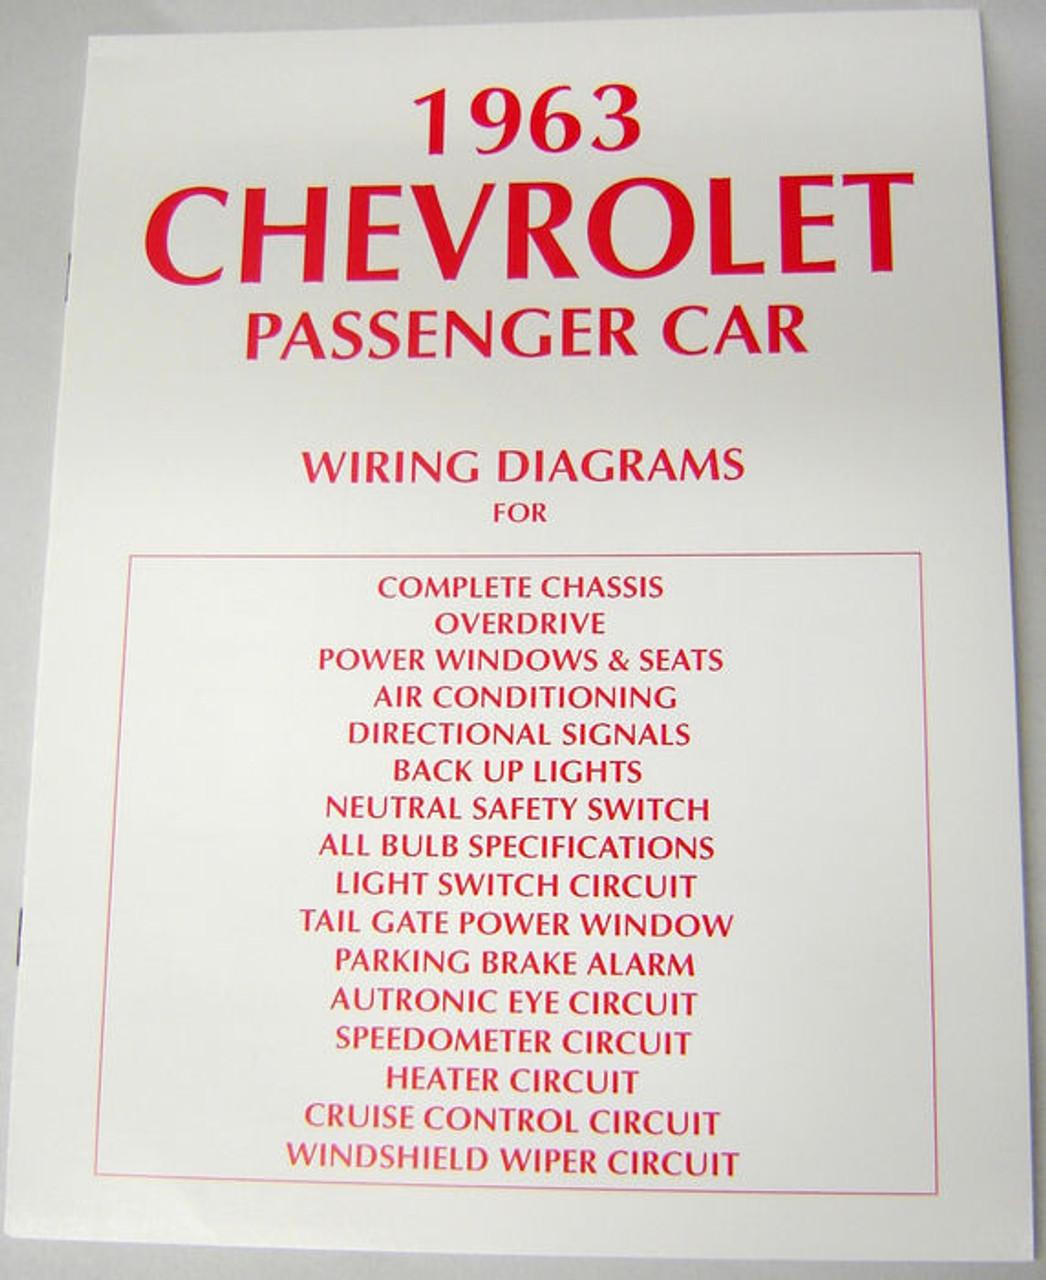 L1016_zpsdlq6nmgy__31214.1443480568?c=2 63 chevy impala electrical wiring diagram manual 1963 i 5 1963 impala headlight switch wiring diagram at eliteediting.co